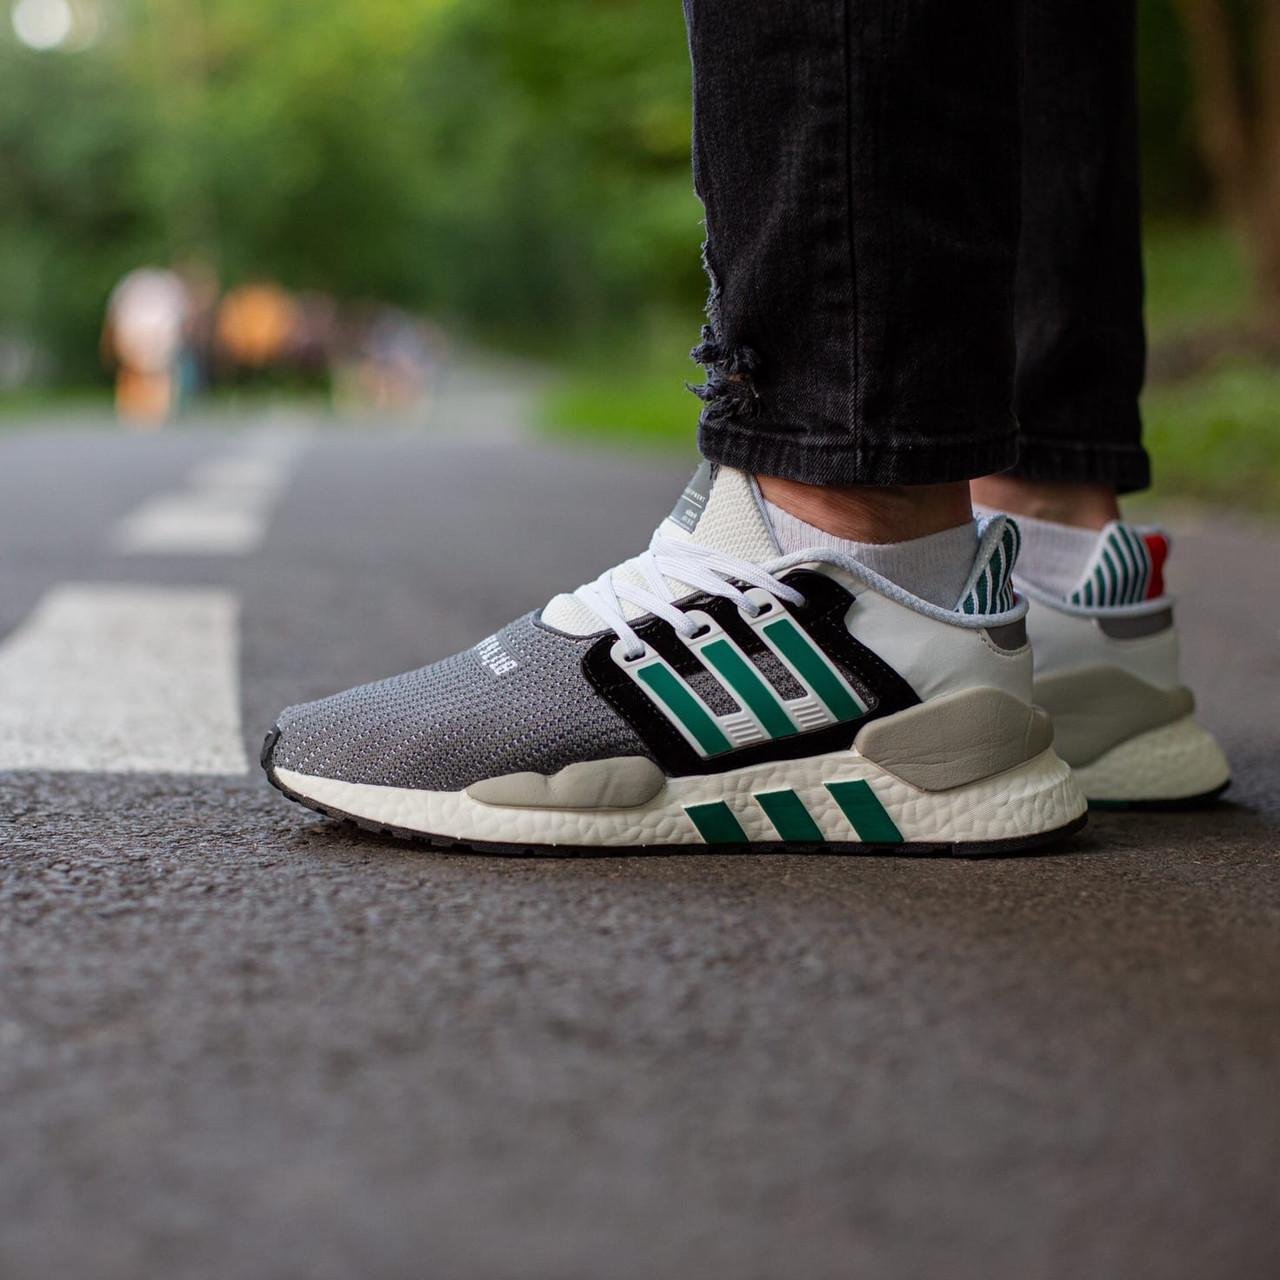 Мужские кроссовки Adidas EQT Support white grey, Реплика